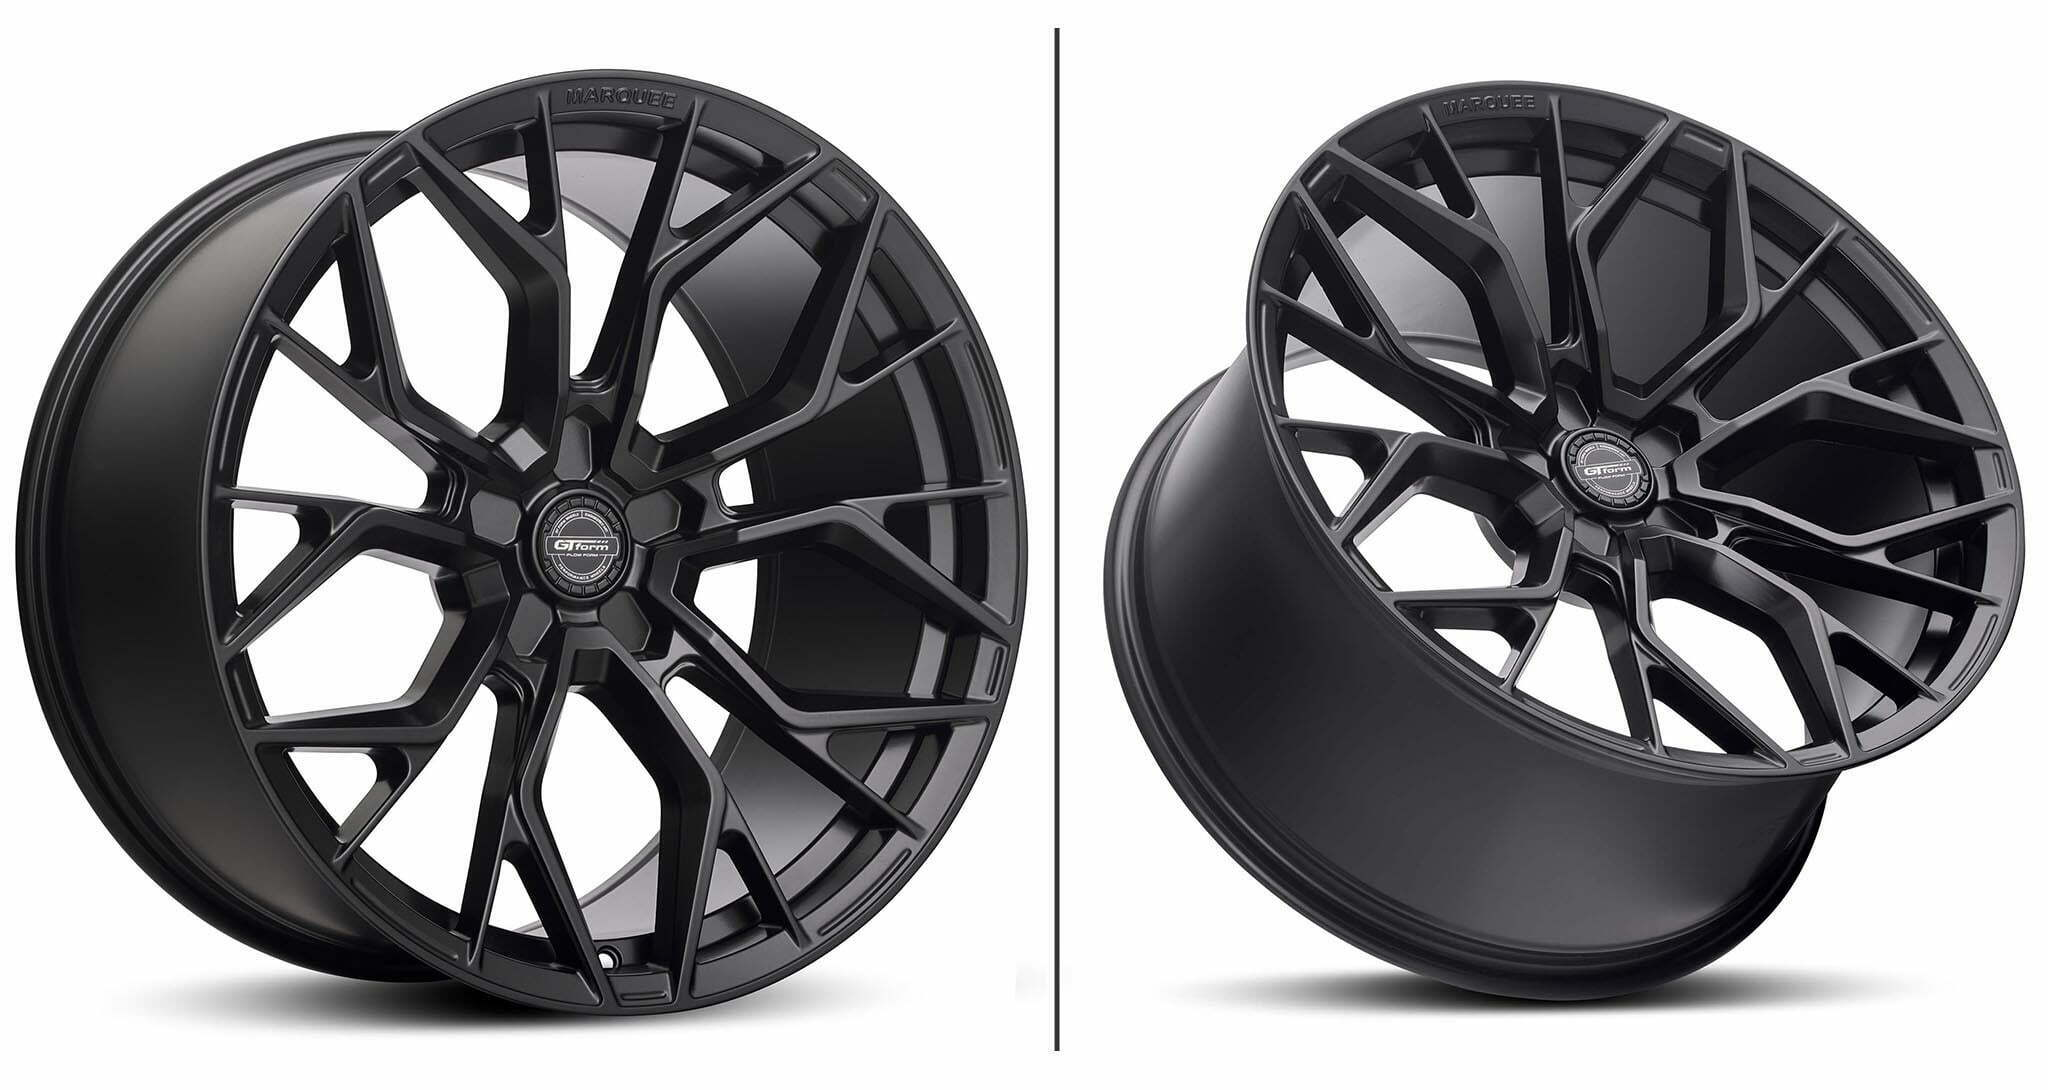 GT Form Manquee Satin Black Wheel Performance Rims